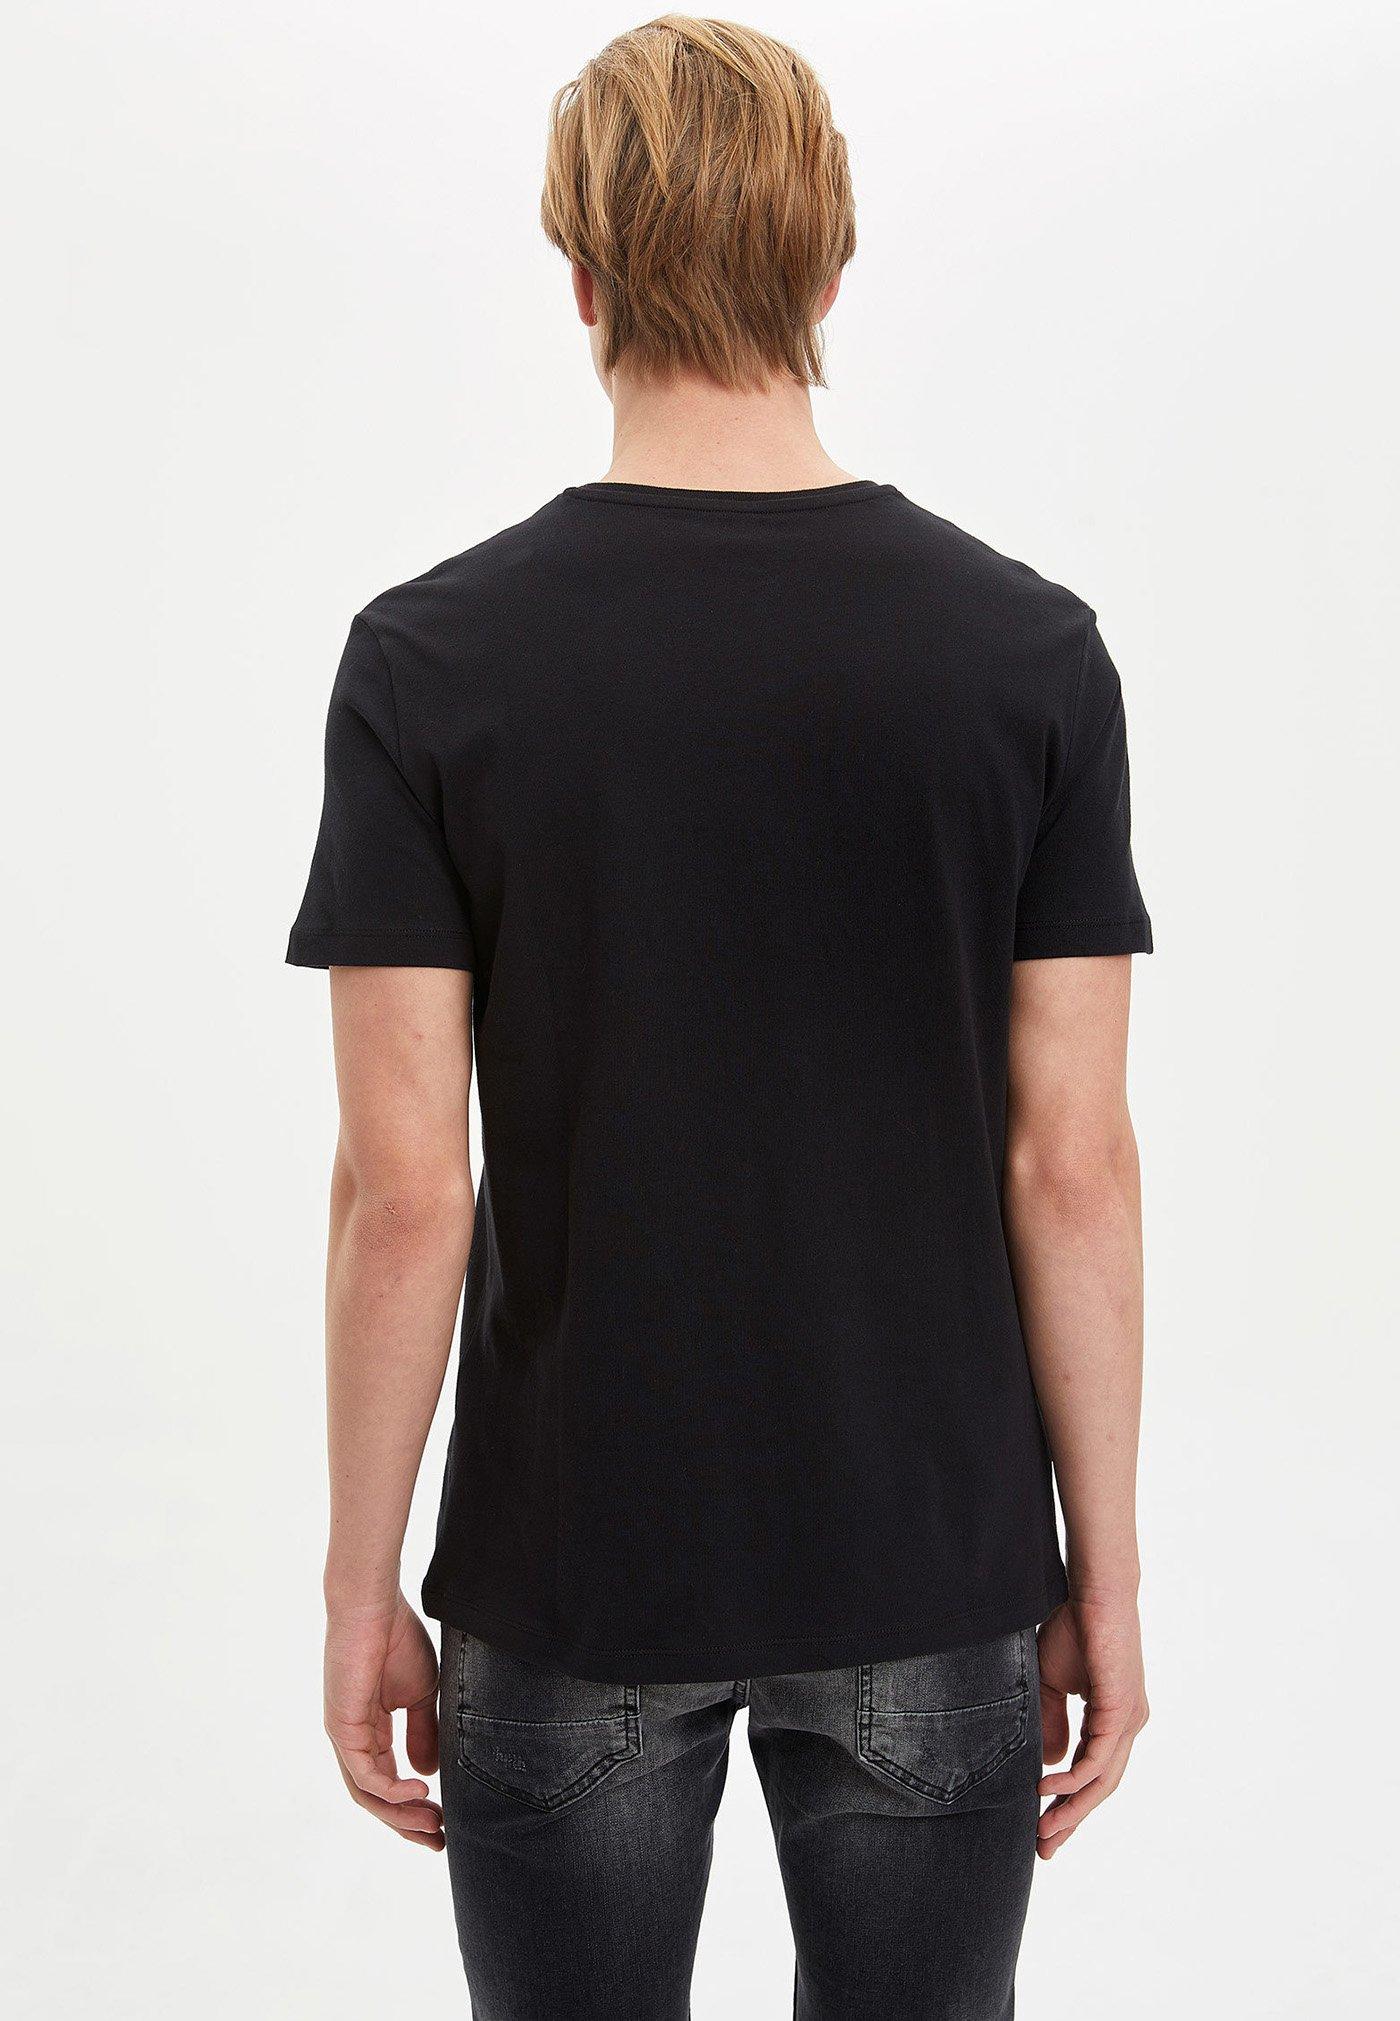 DeFacto Print T-shirt - black PEPtz